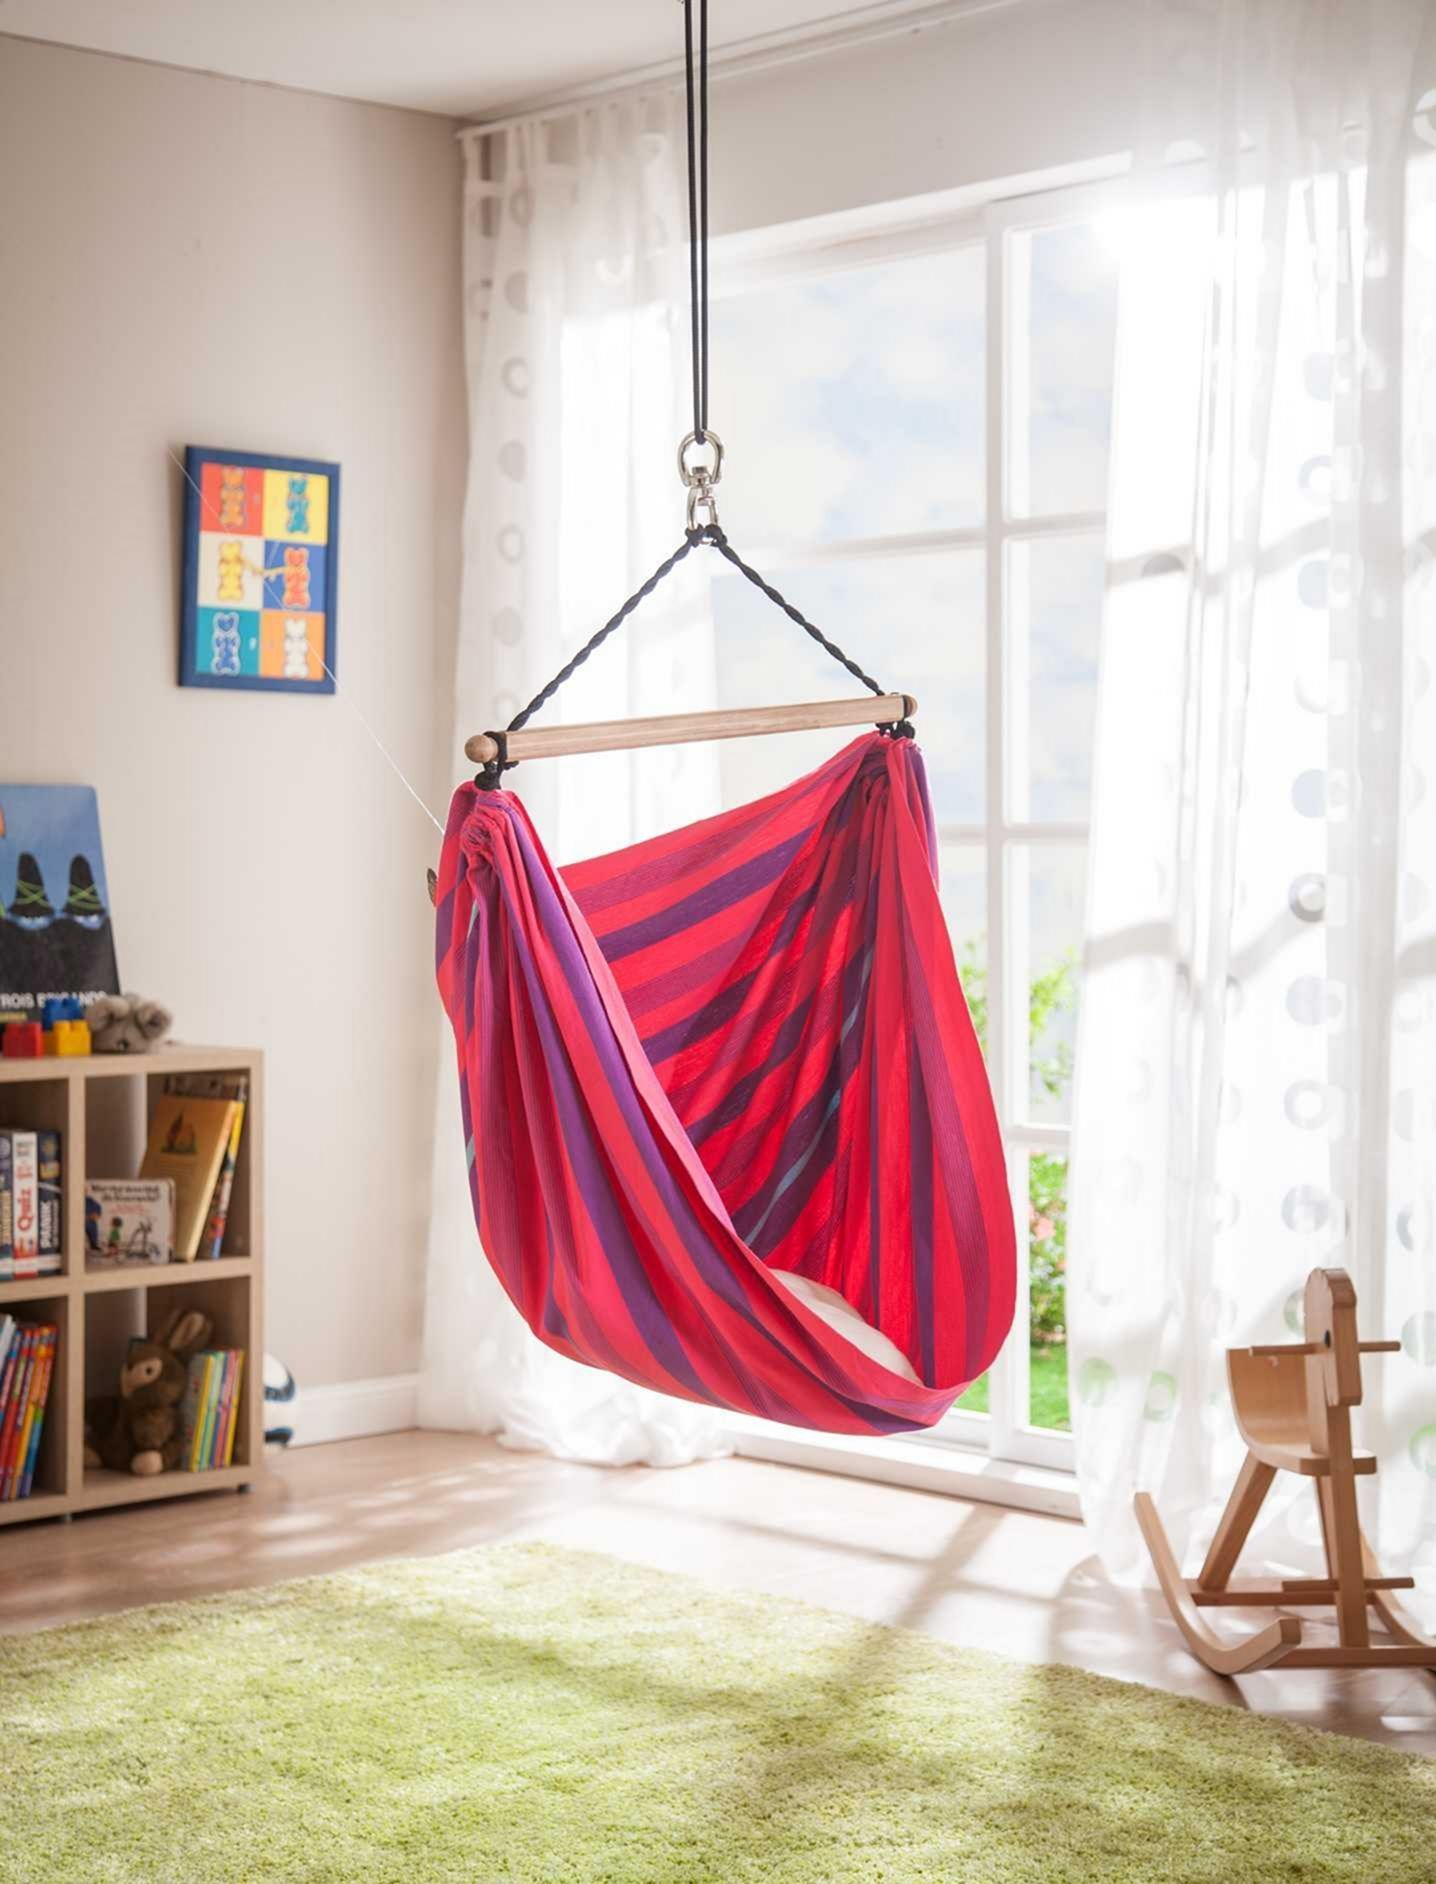 20 incredible diy hammock design ideas for your home